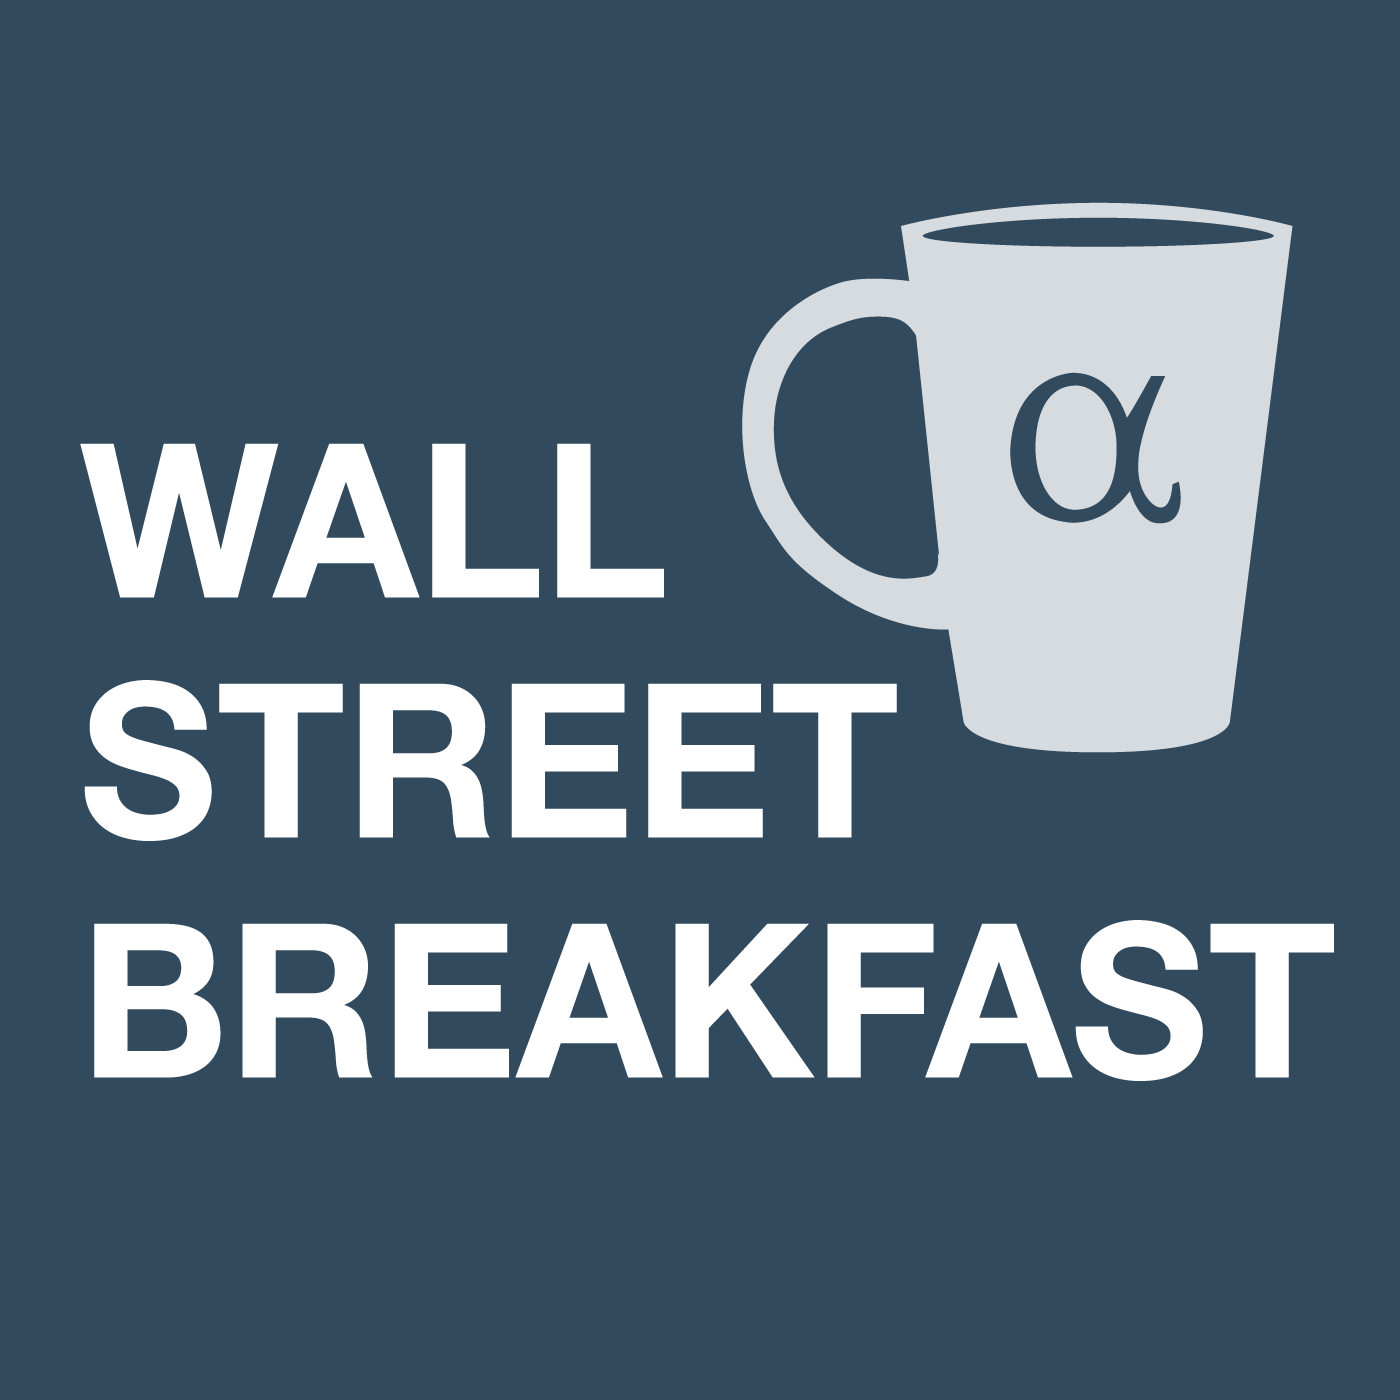 Wall Street Breakfast April 29: Prime Time